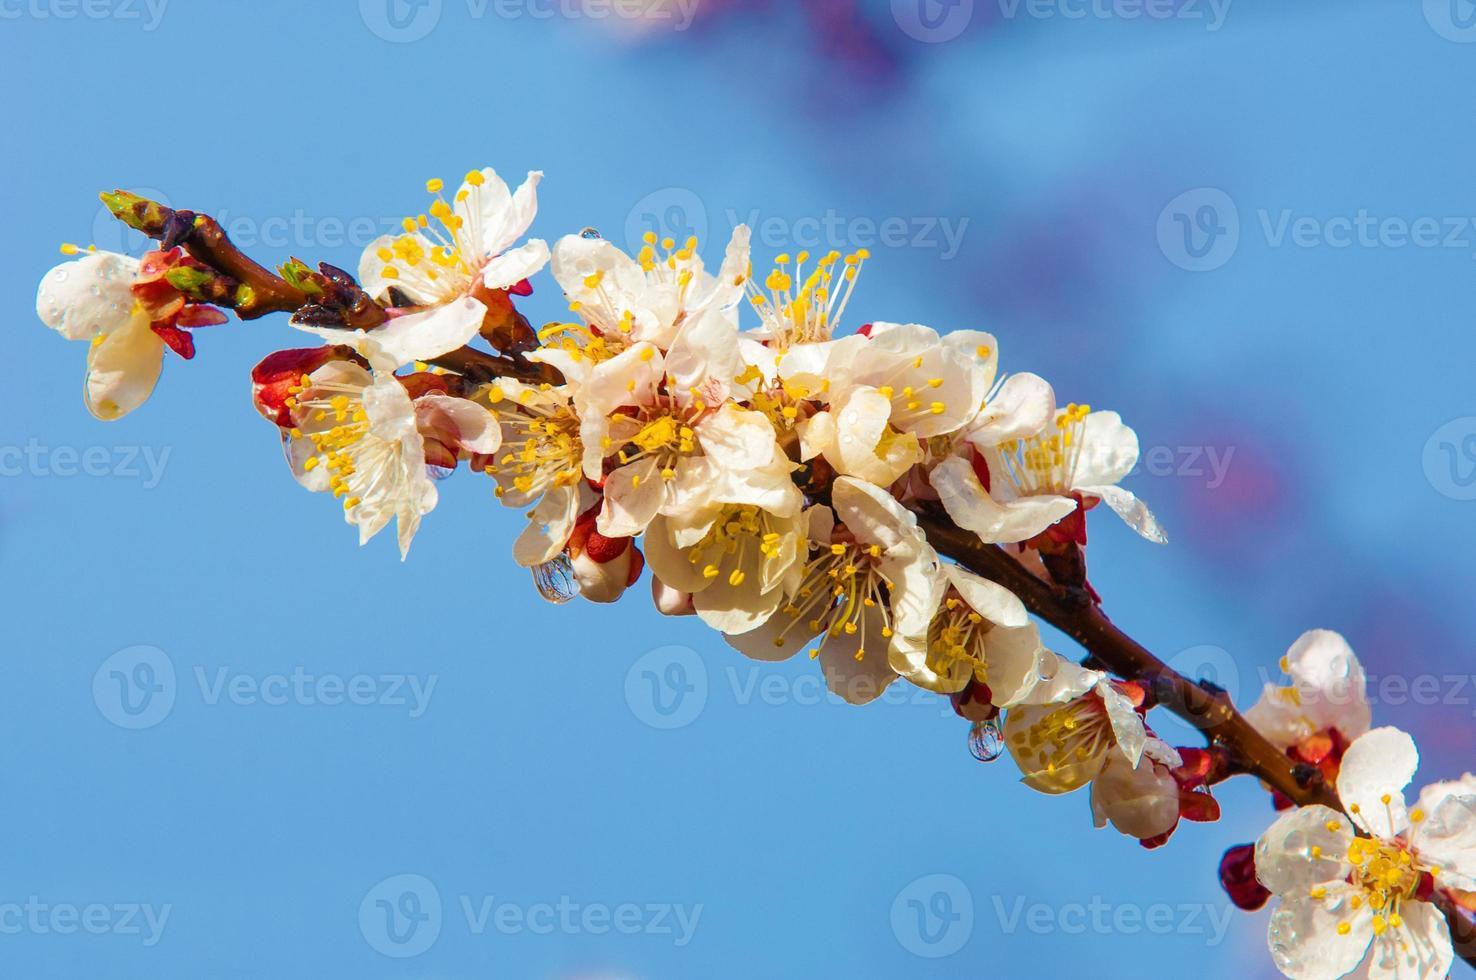 Frühlingsbäume in voller Blüte foto